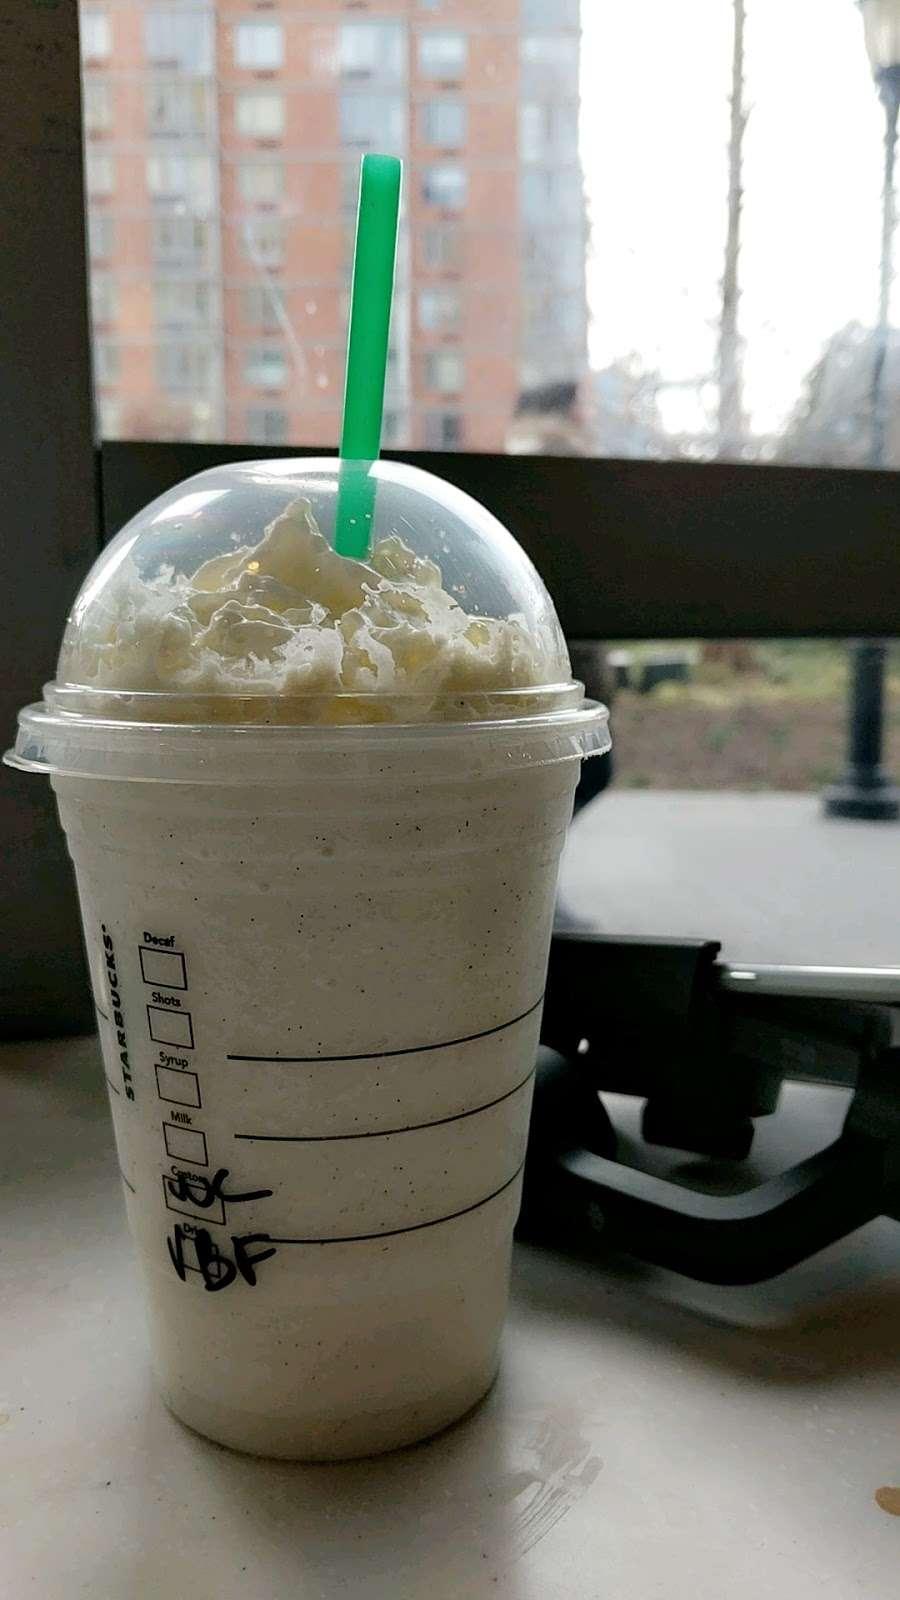 Starbucks - cafe    Photo 10 of 10   Address: 455 Main St, New York, NY 10044, USA   Phone: (212) 371-1298